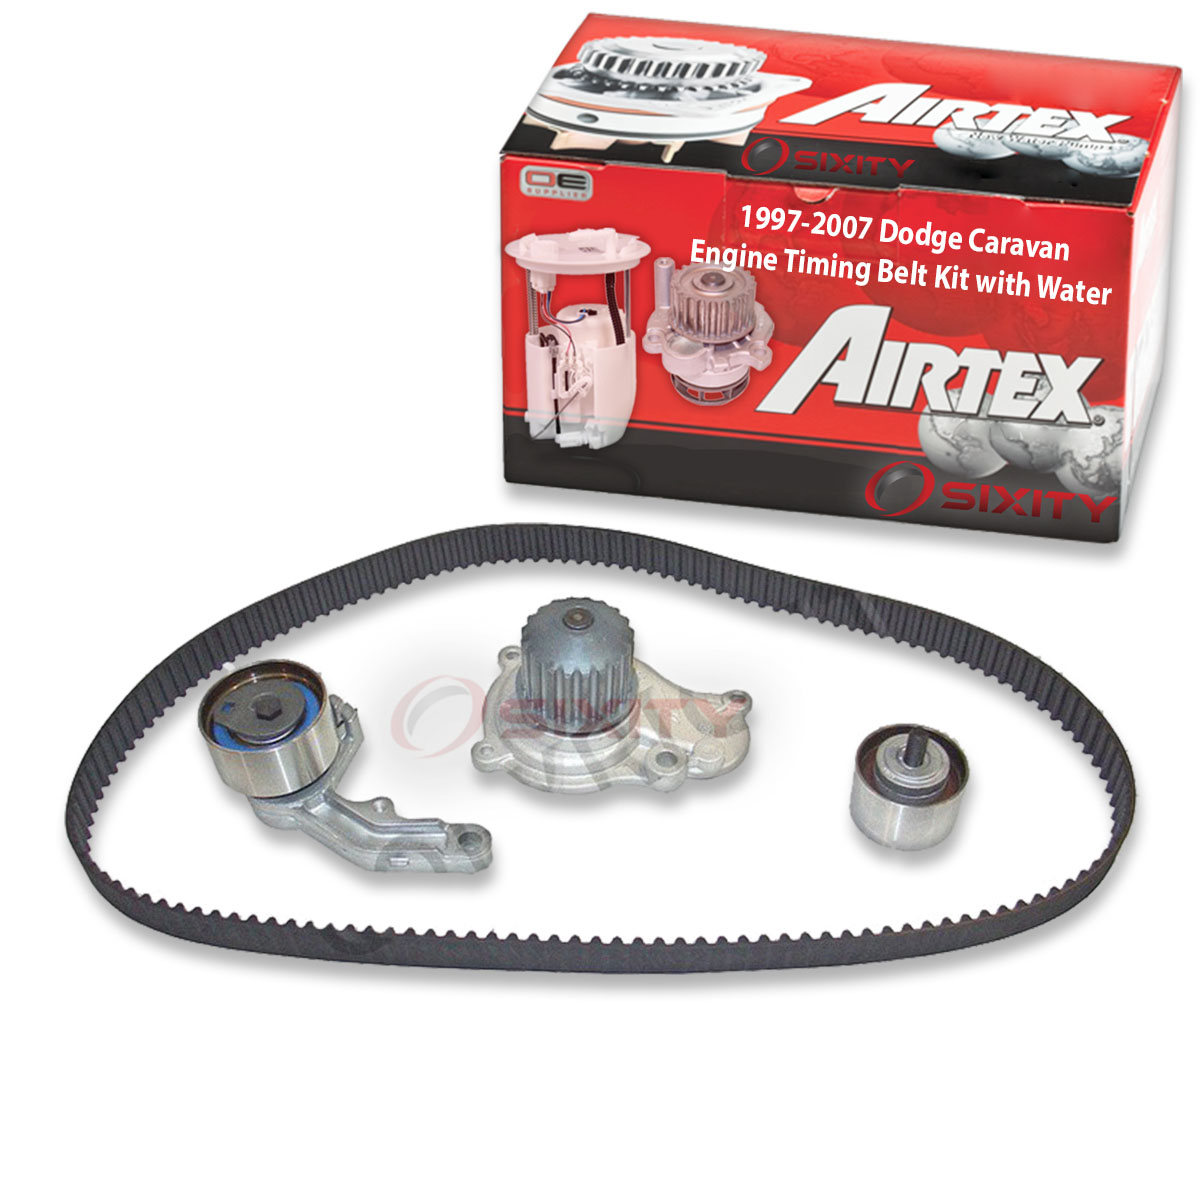 Airtex AWK1225 Engine Timing Belt Kit with Water Pump Motors ...